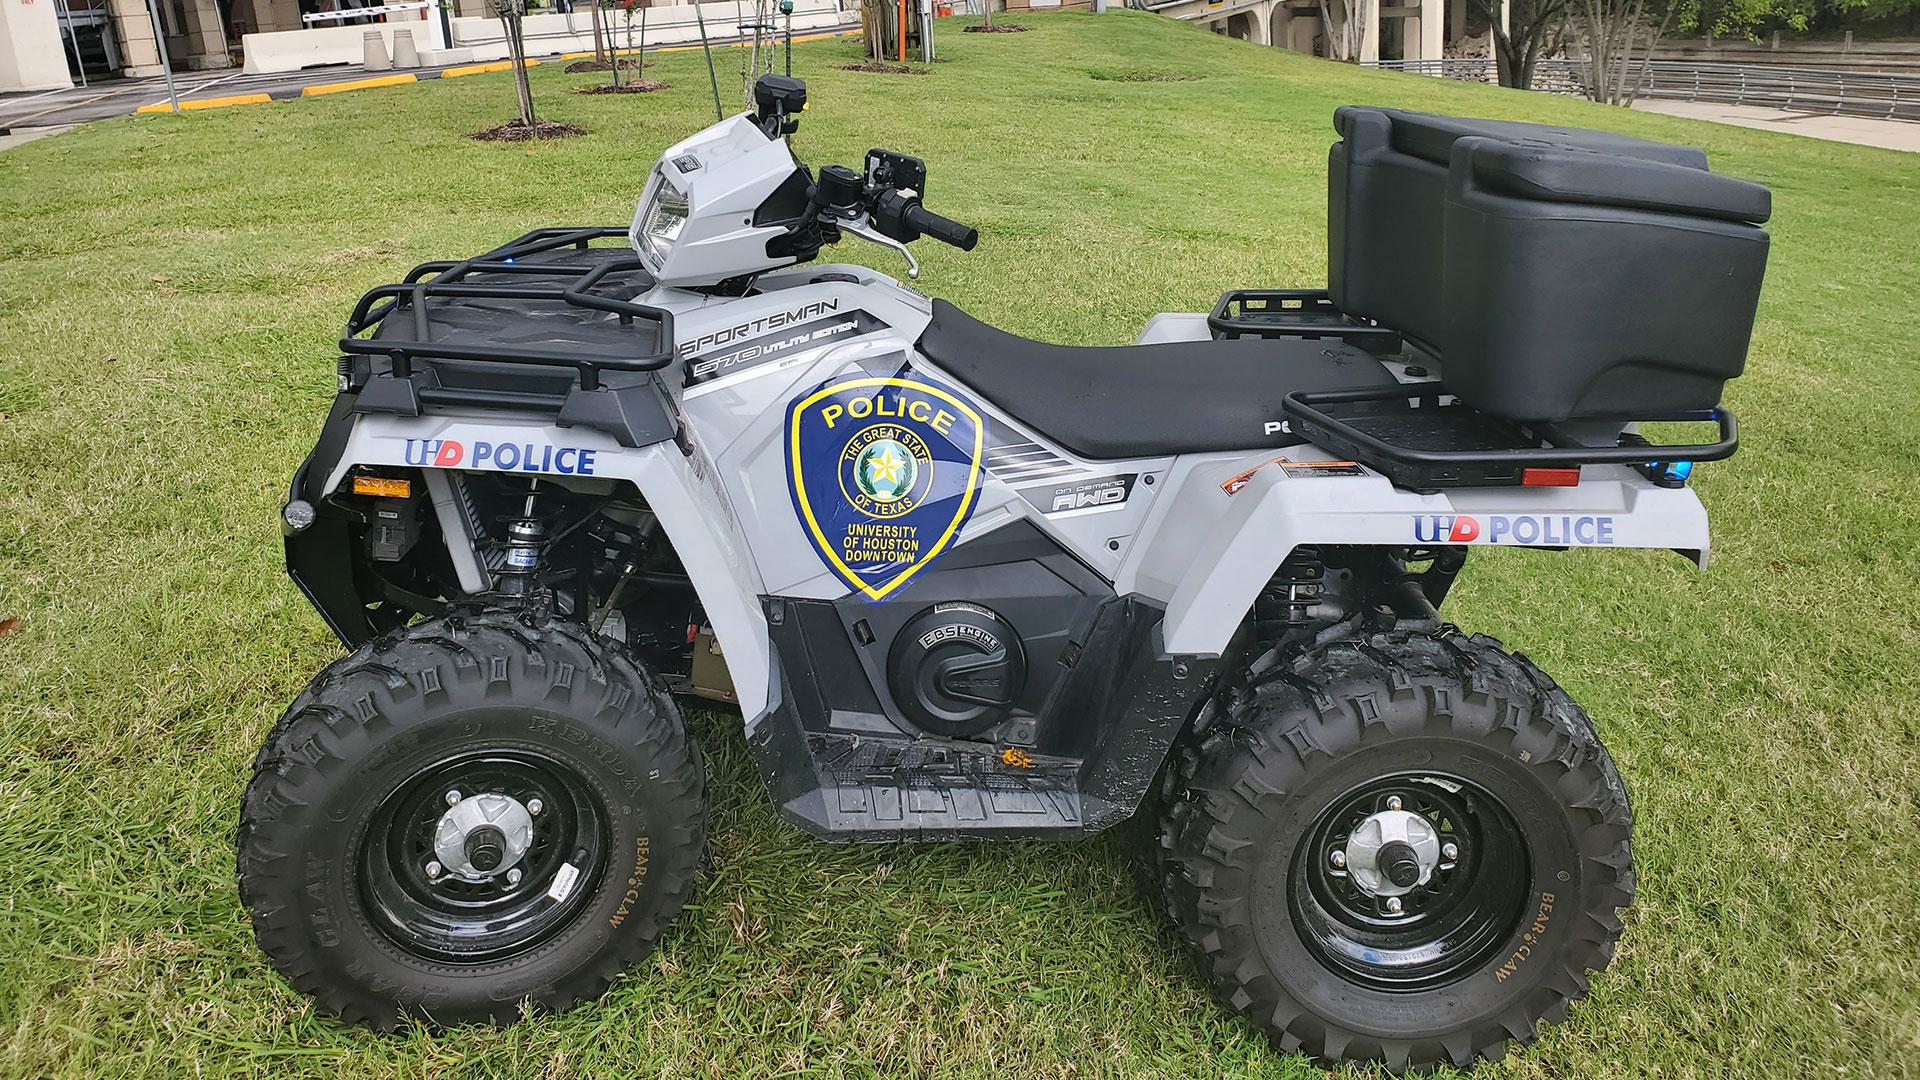 UHD Police Department ATV